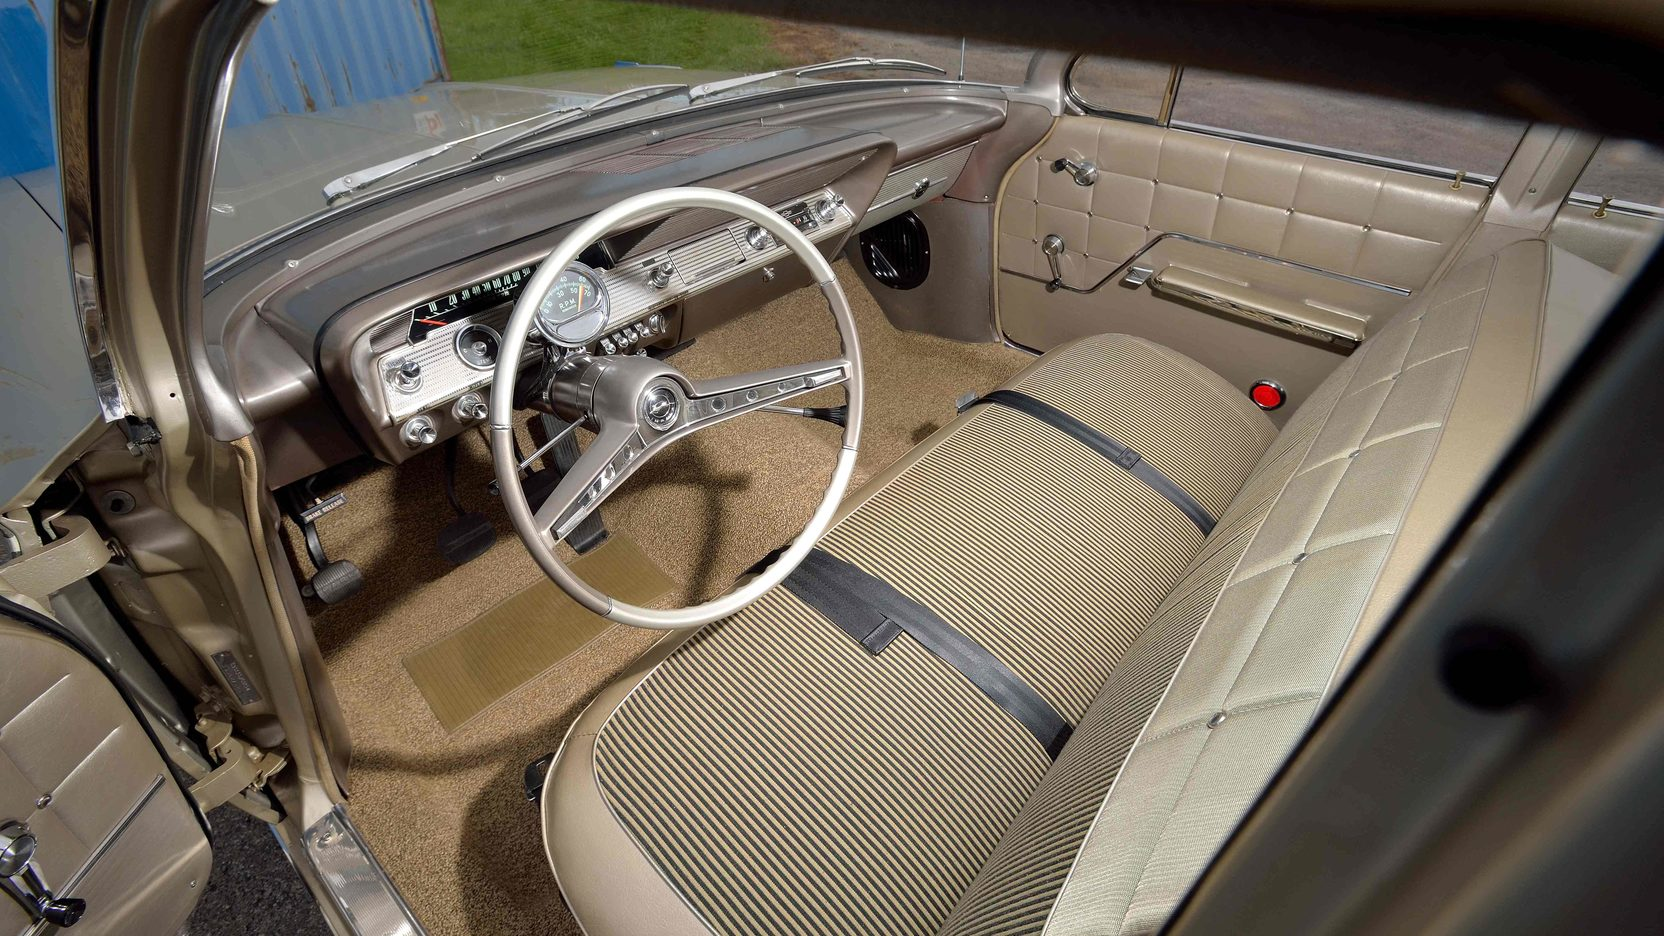 1962 Chevrolet Impala interior